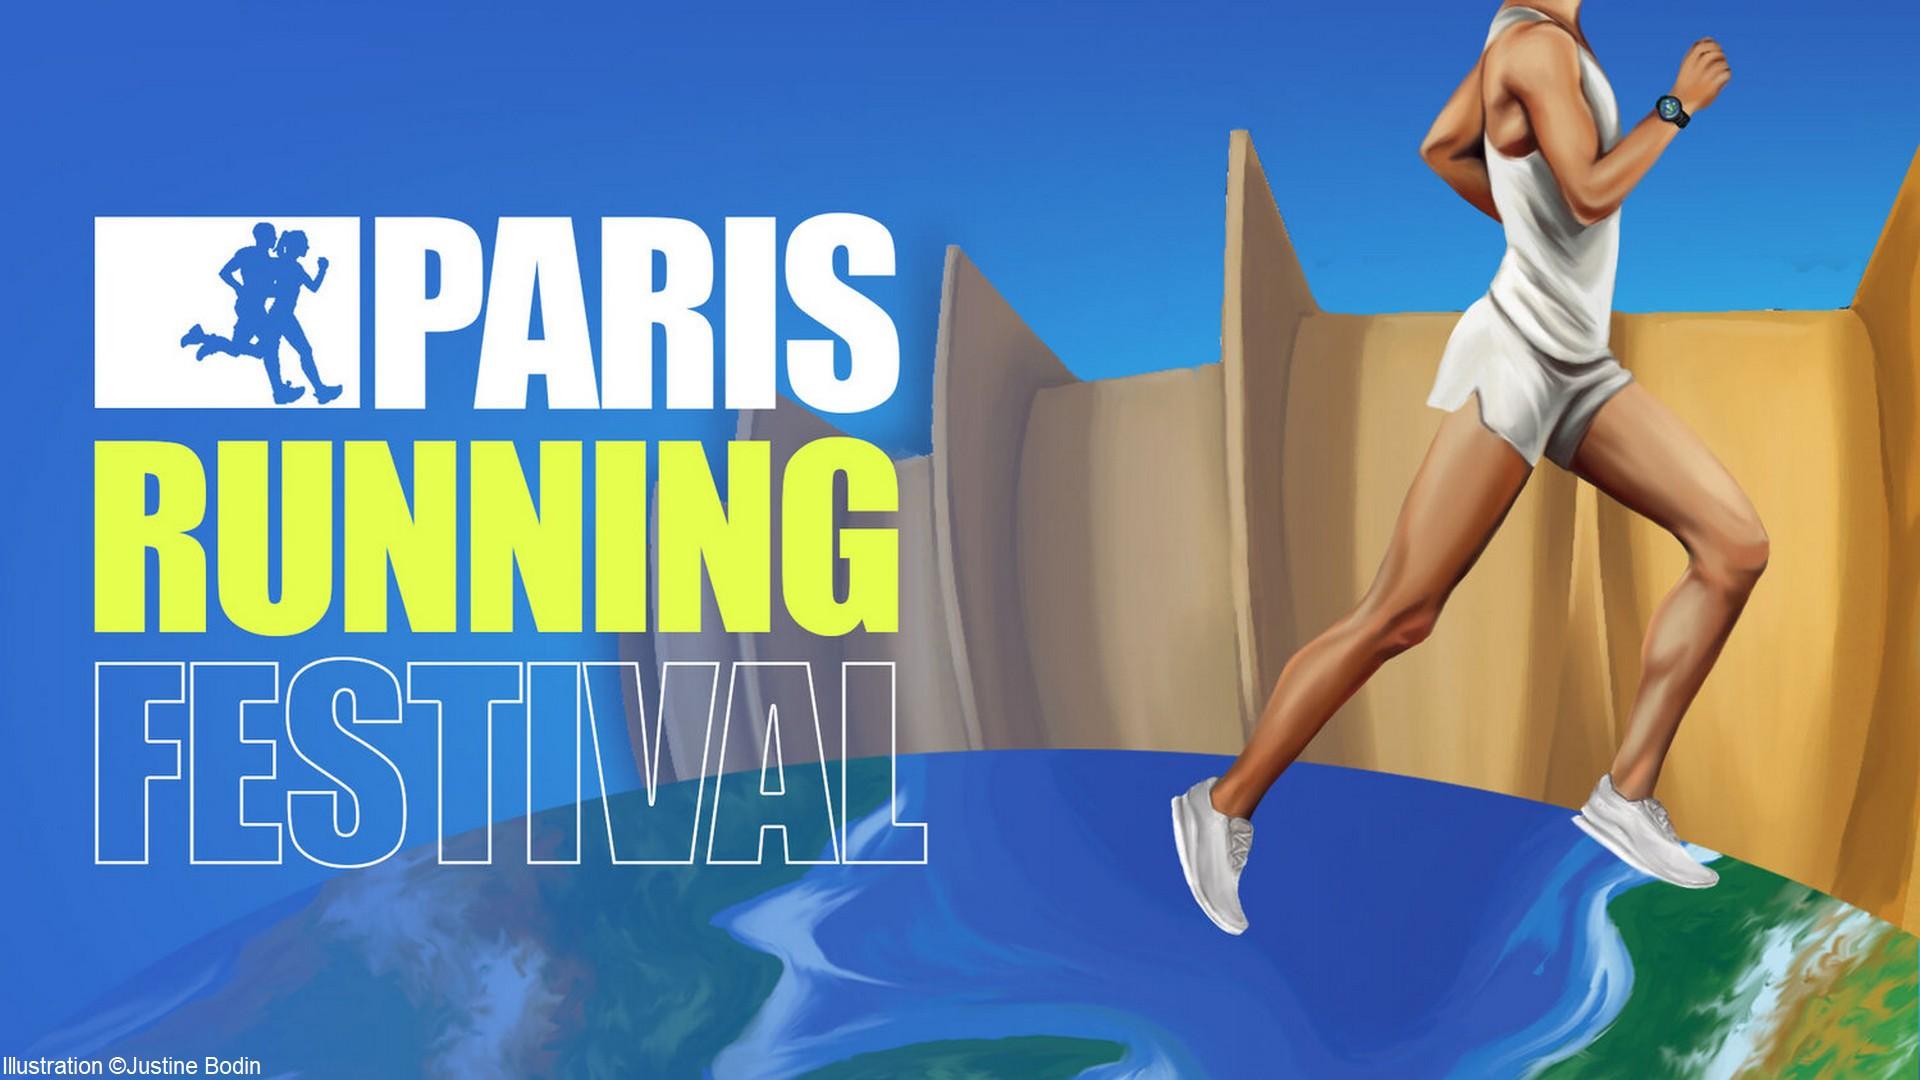 Paris Running Festival (2) Illustration (c) Justine Bodin